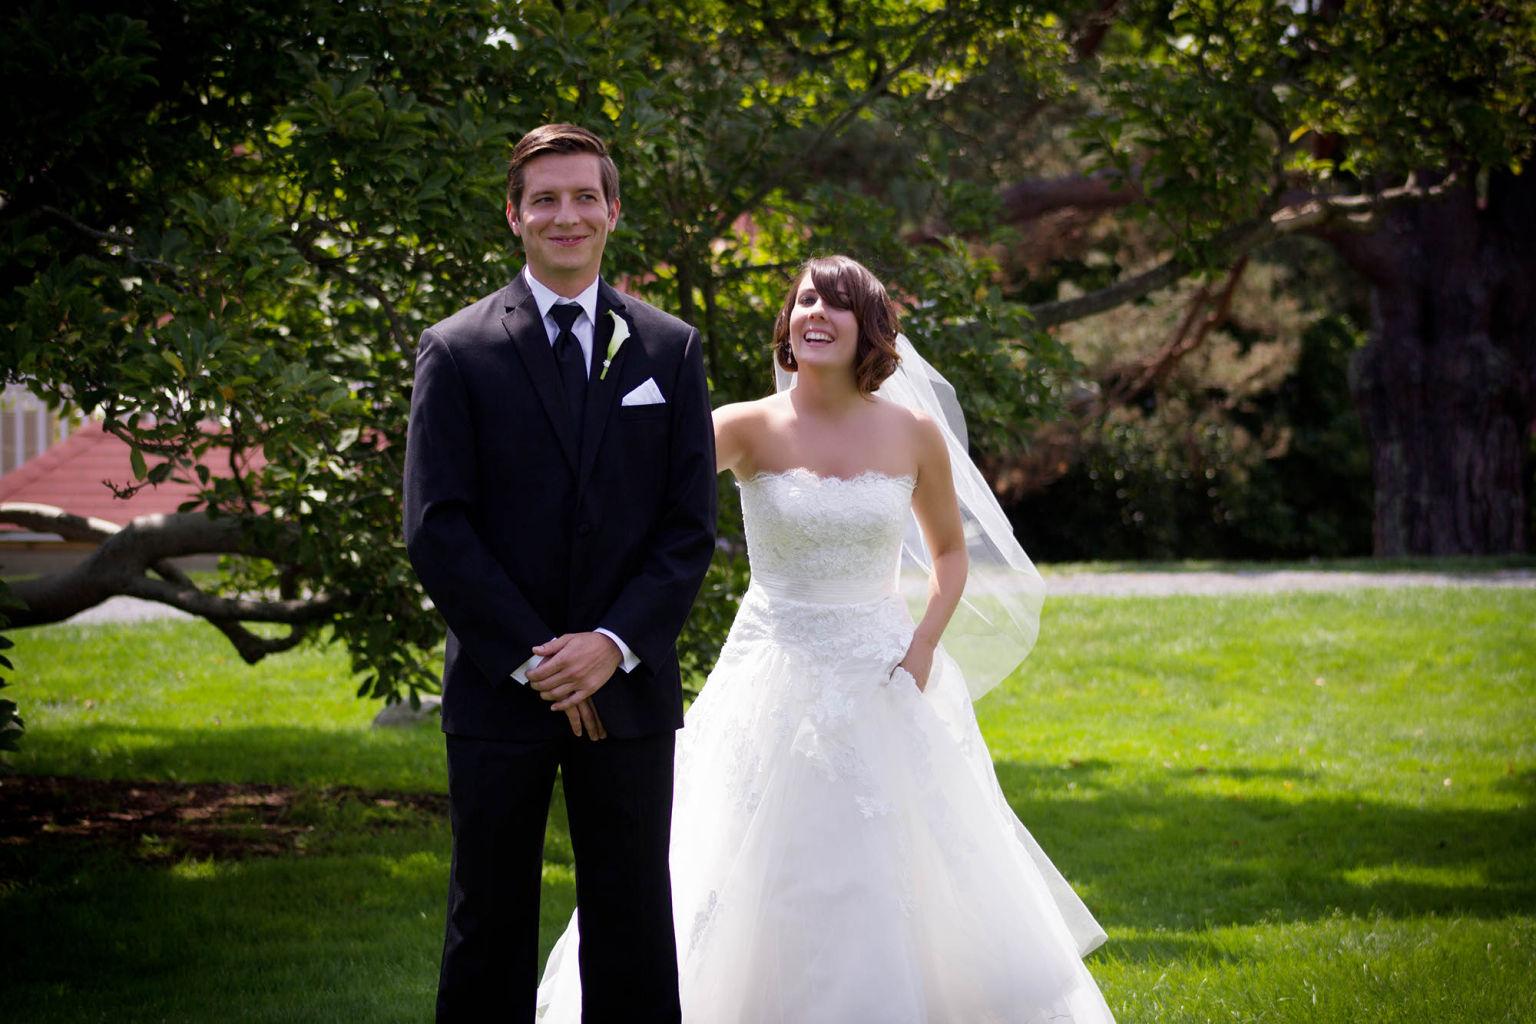 Wentworth-weddings-122LaurenMike-1141 A